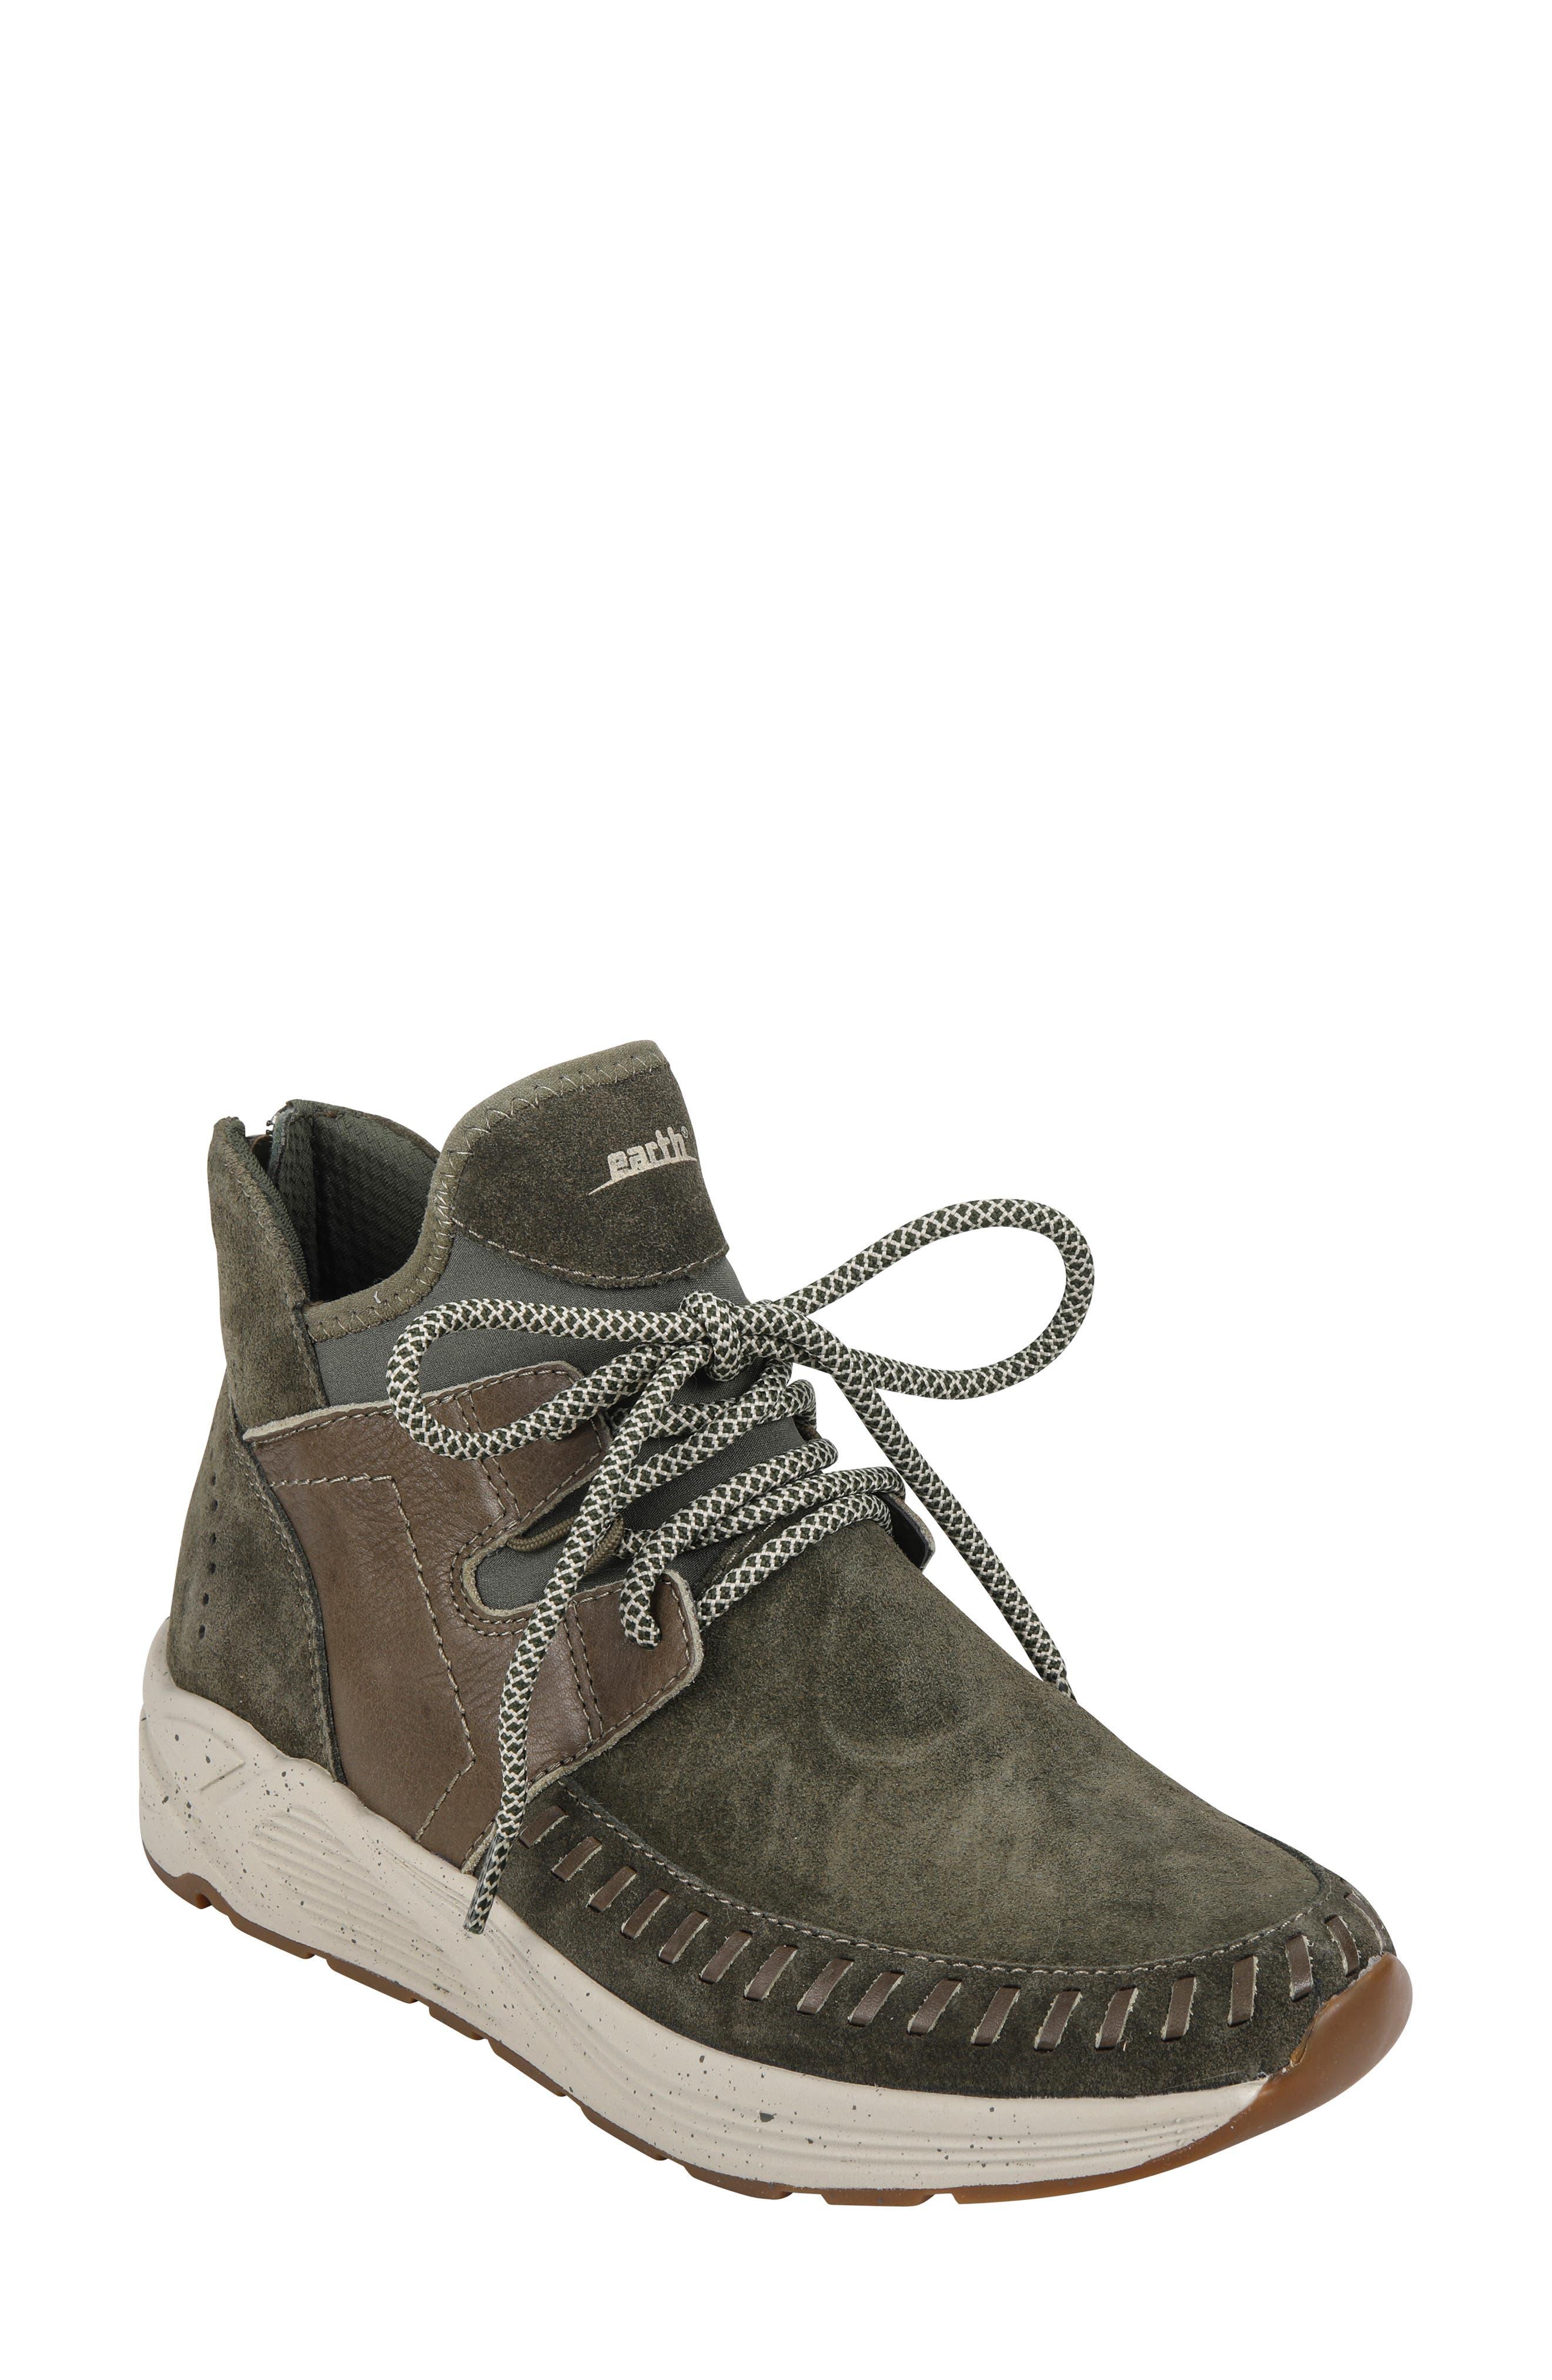 Earth Jaunt Sneaker- Green